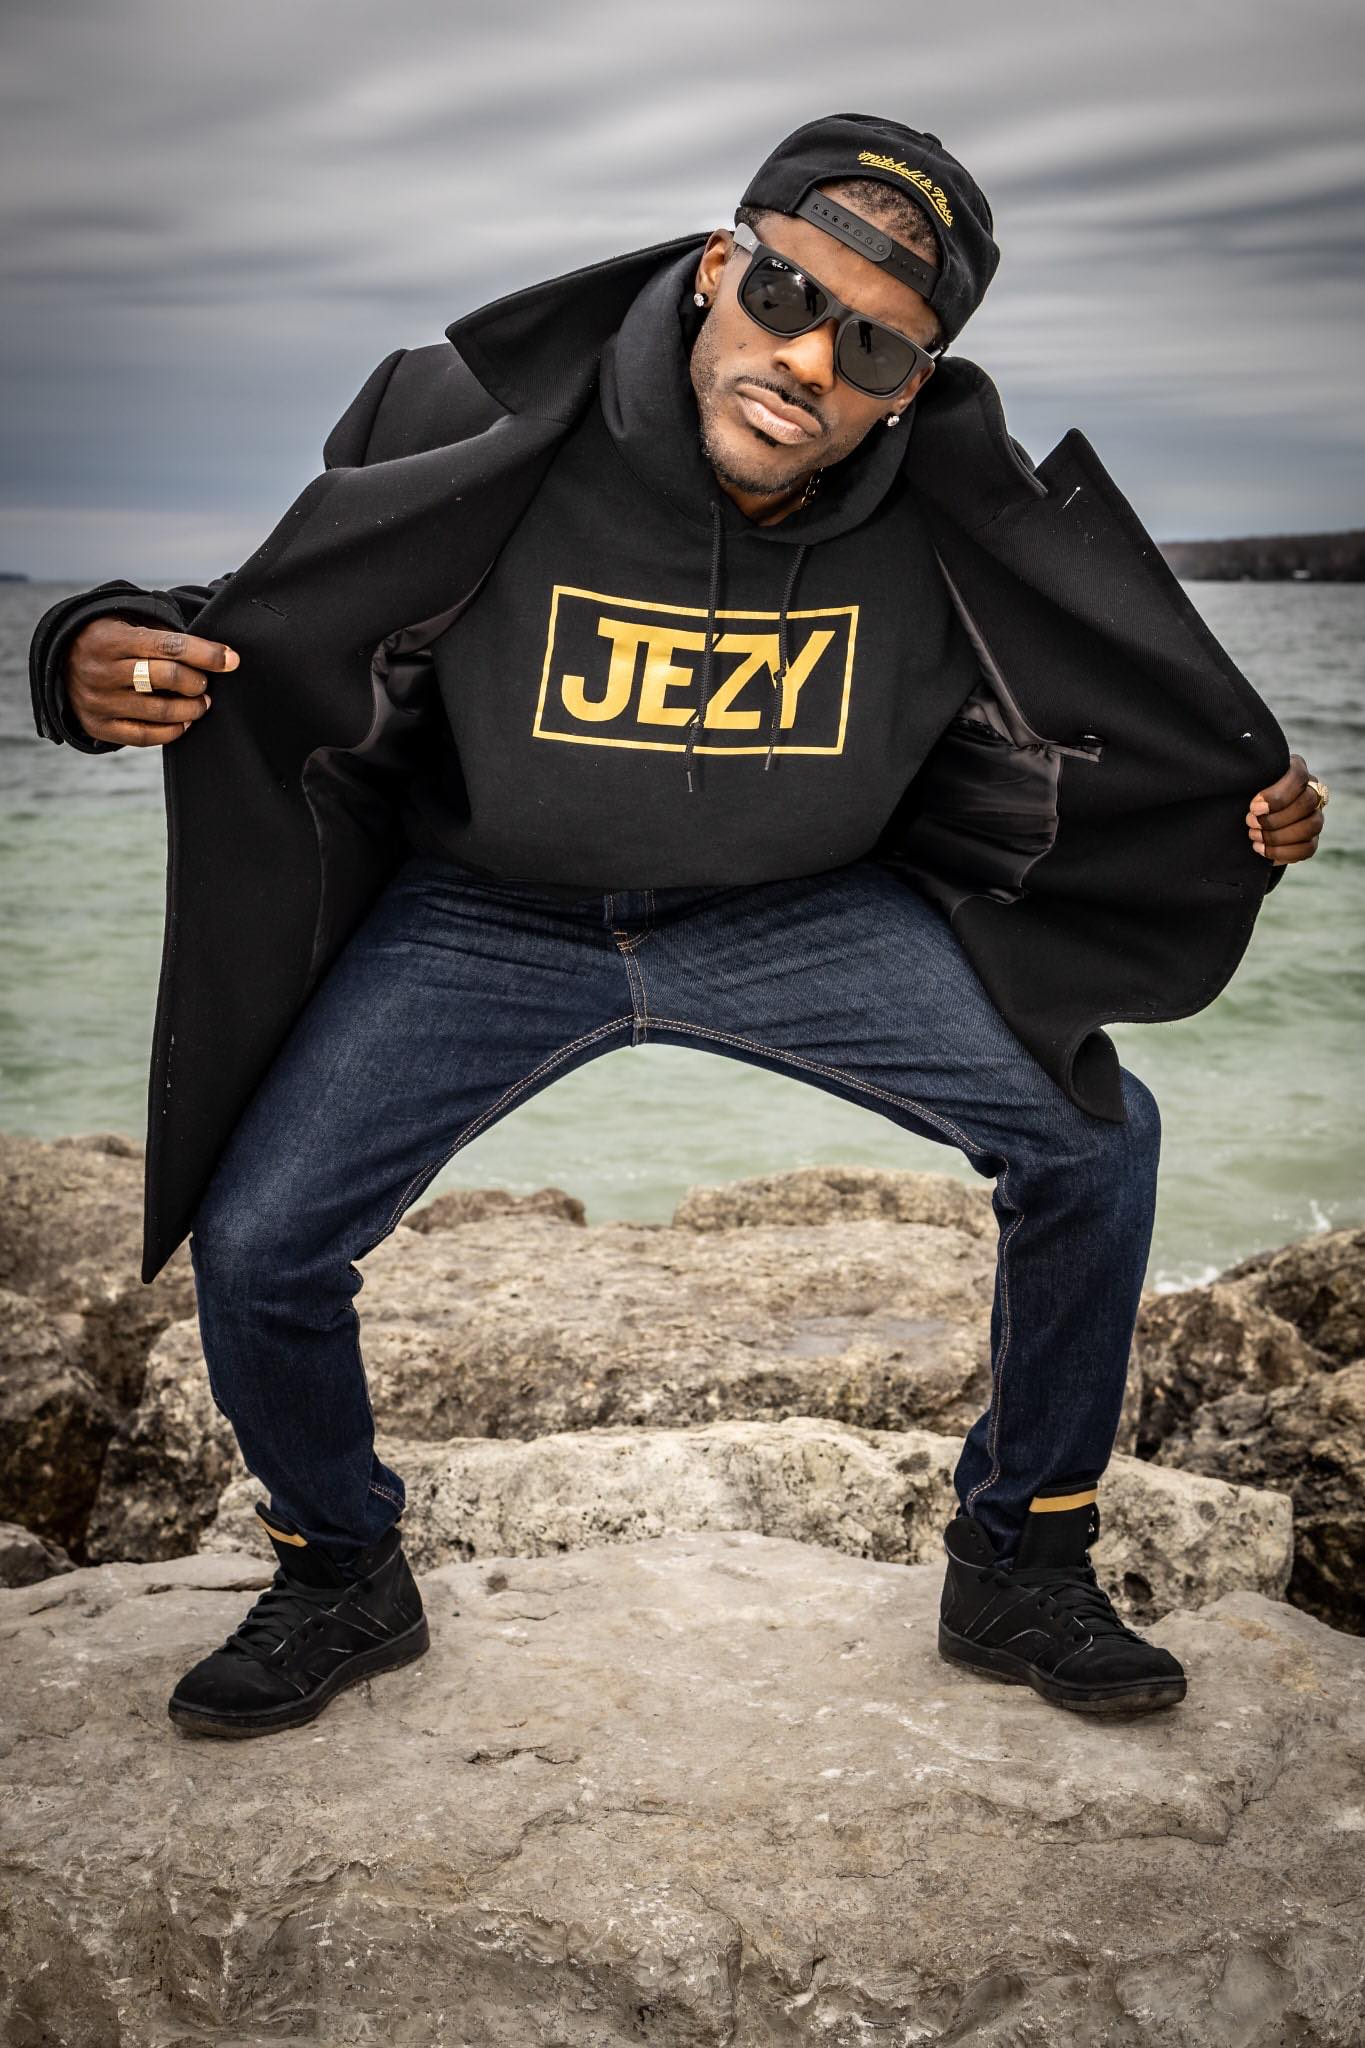 Big Sean, B.O.B, T.I, Lil Jon, Lil Scrappy, Mike Jones, Paul Wall Slim Thug, Gucci Mane and Drake inspired Canadian rapper Jezy.